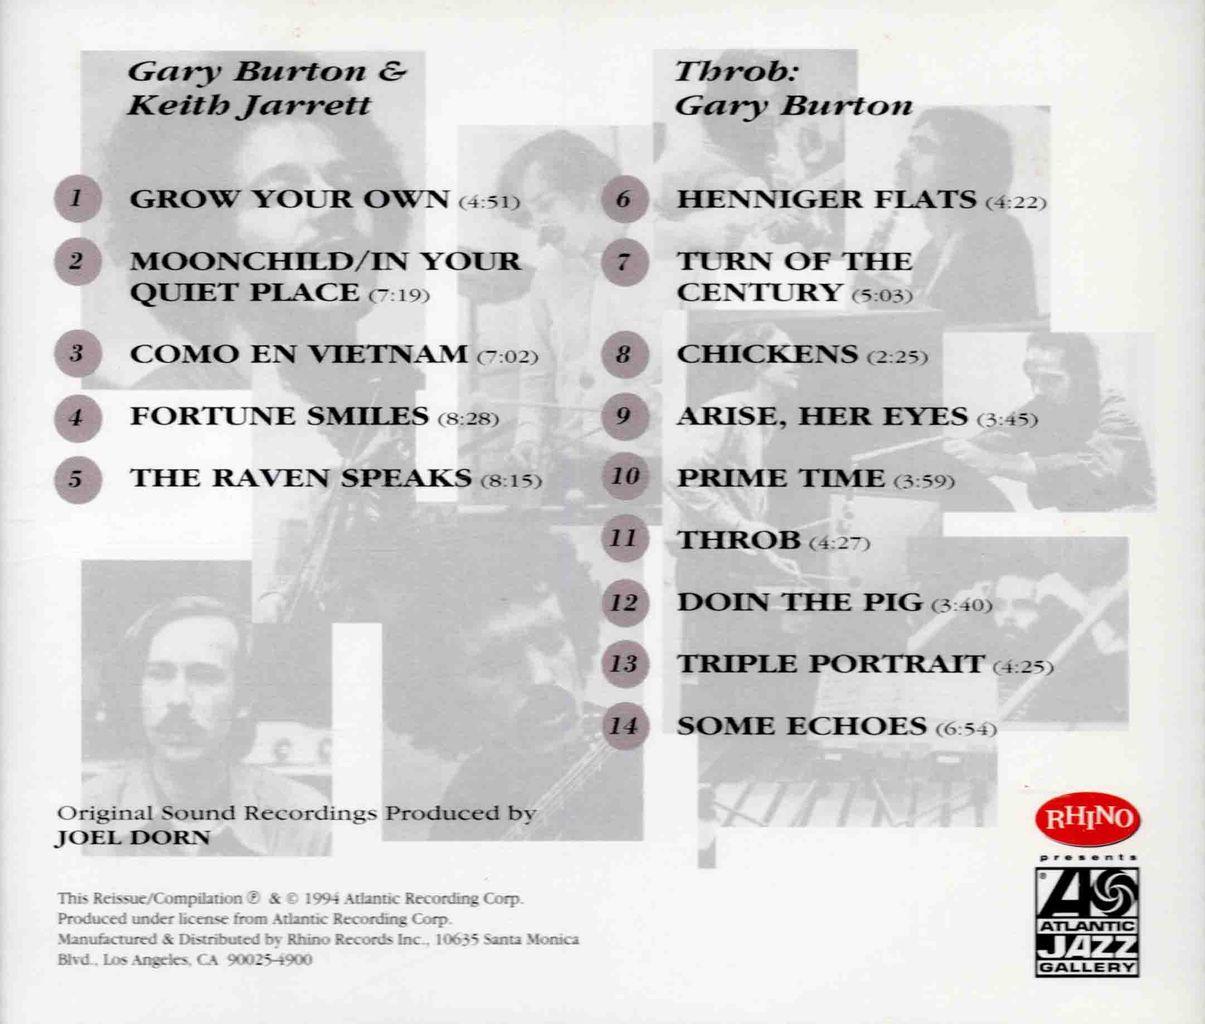 GARY BURTON & KEITH JARRETT-2